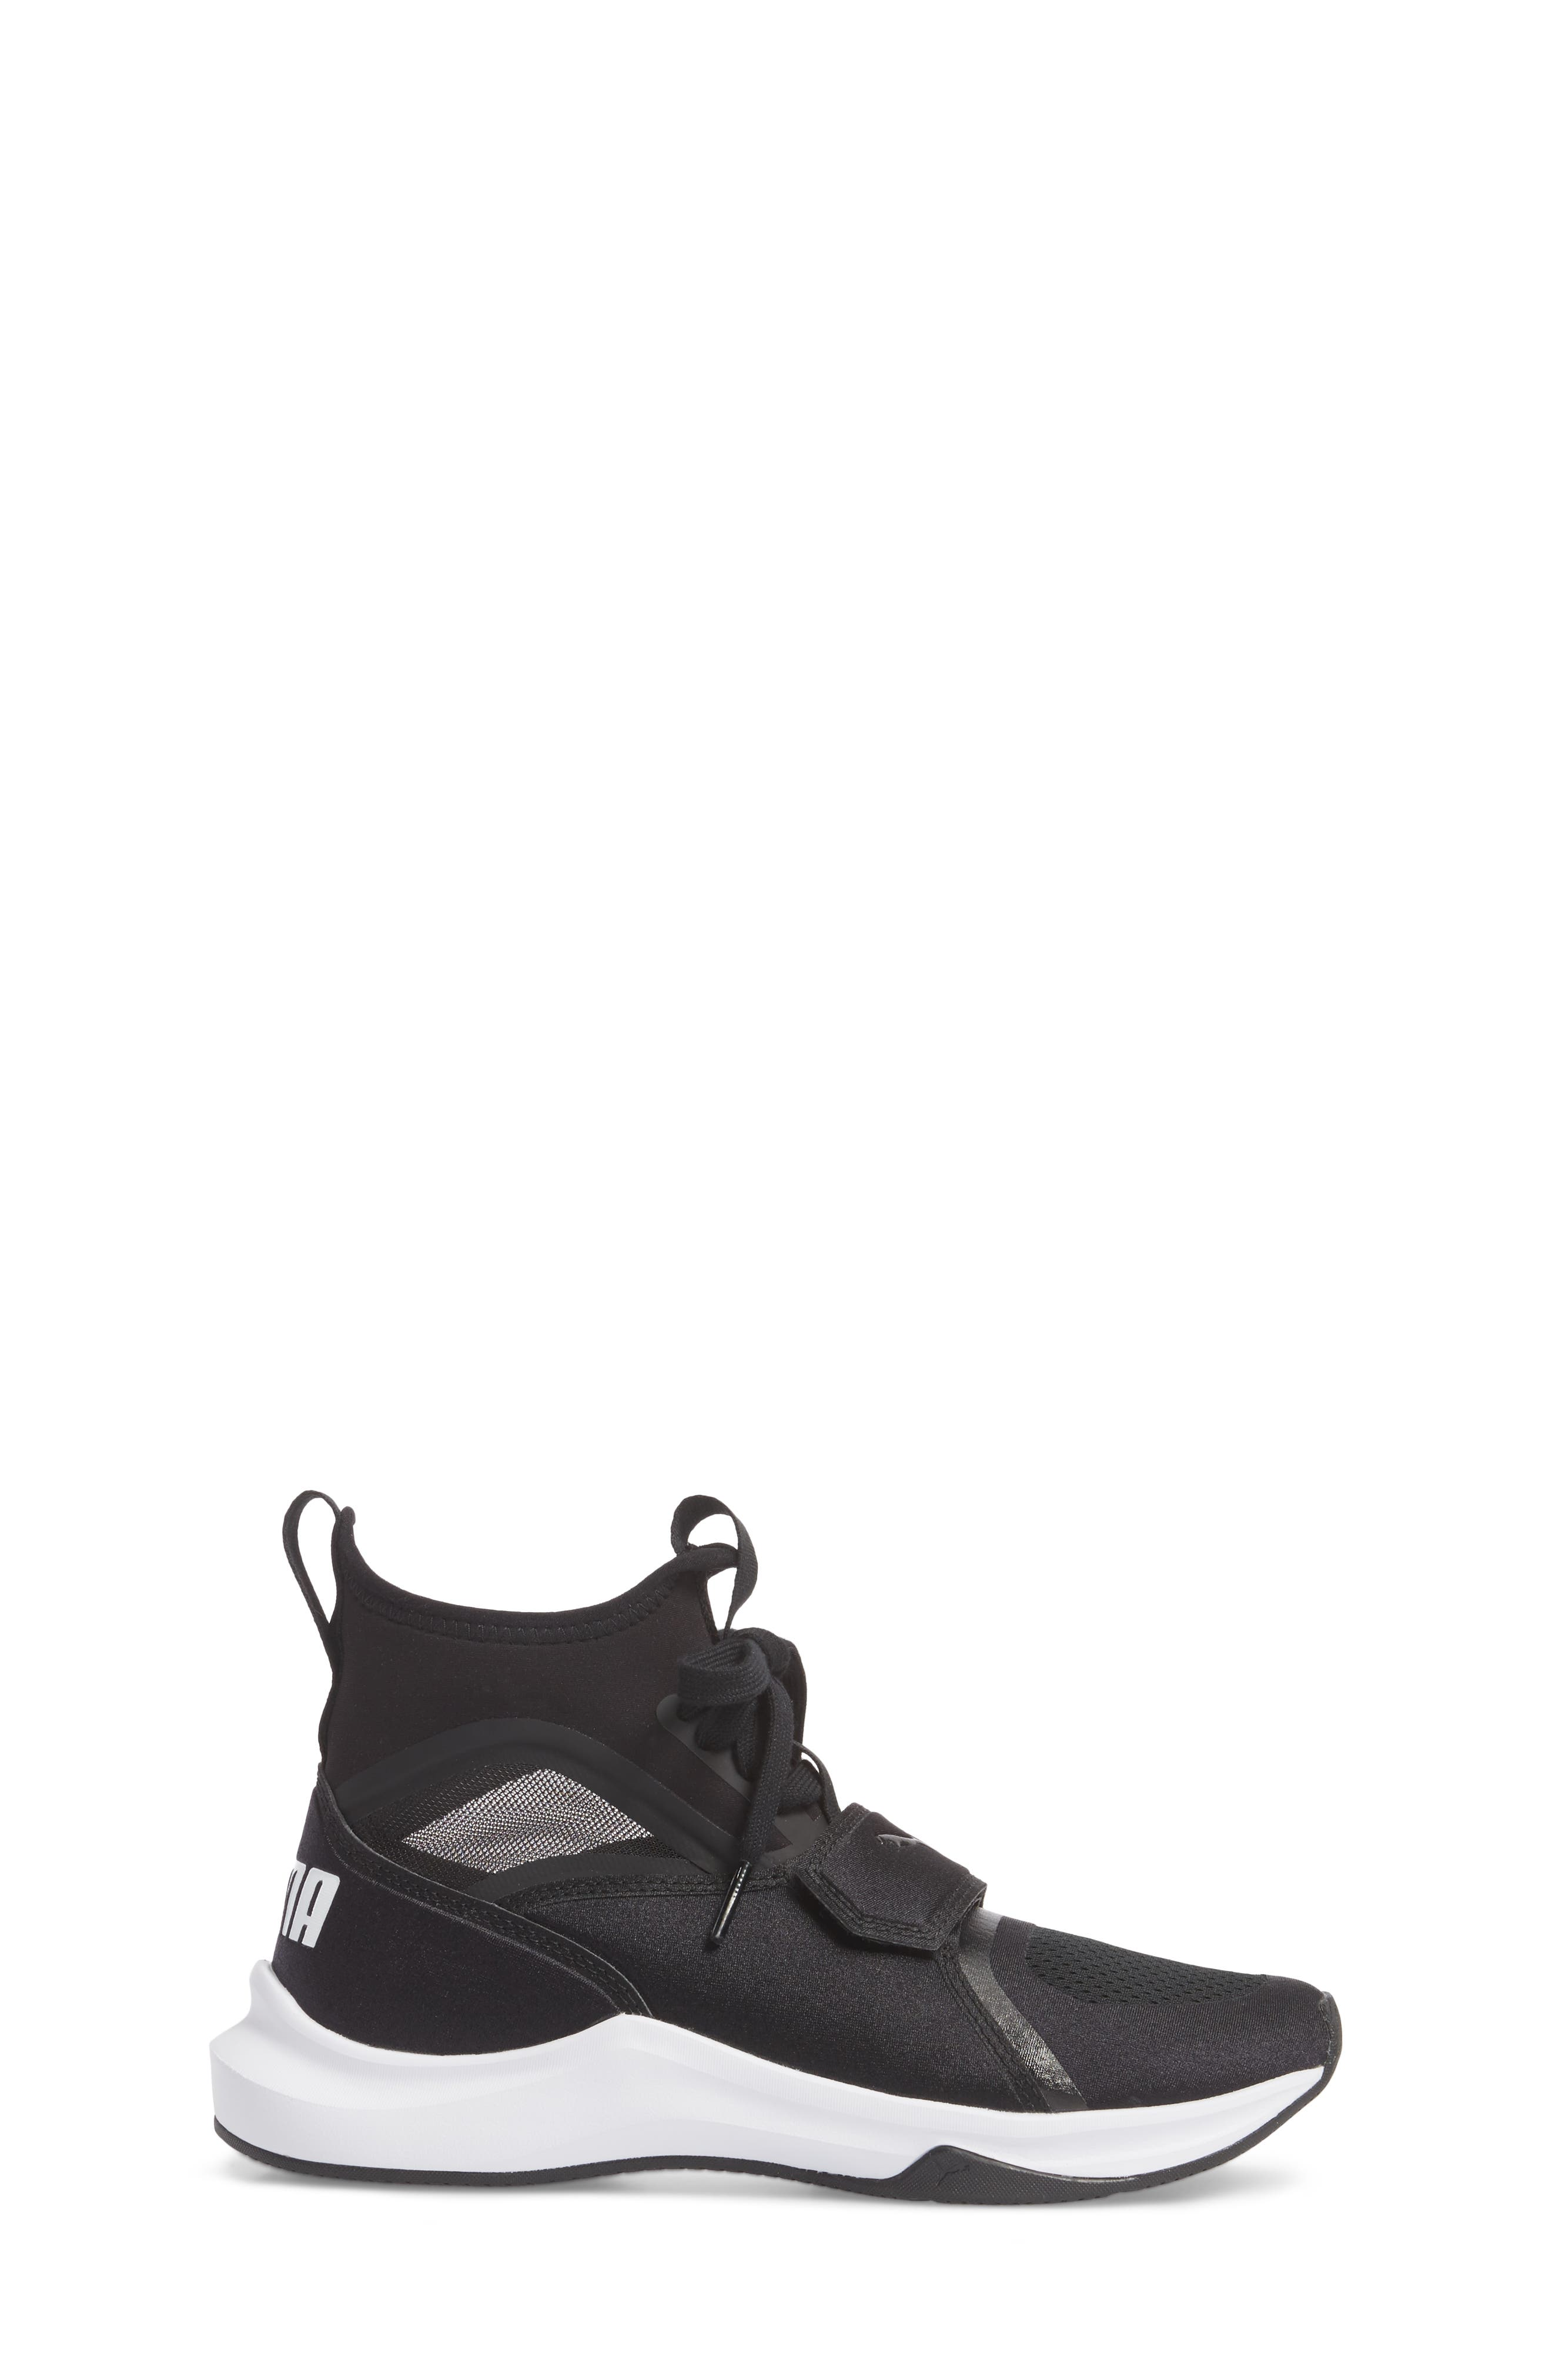 Phenom Jr High Top Sneaker,                             Alternate thumbnail 3, color,                             Puma Black/ Puma White